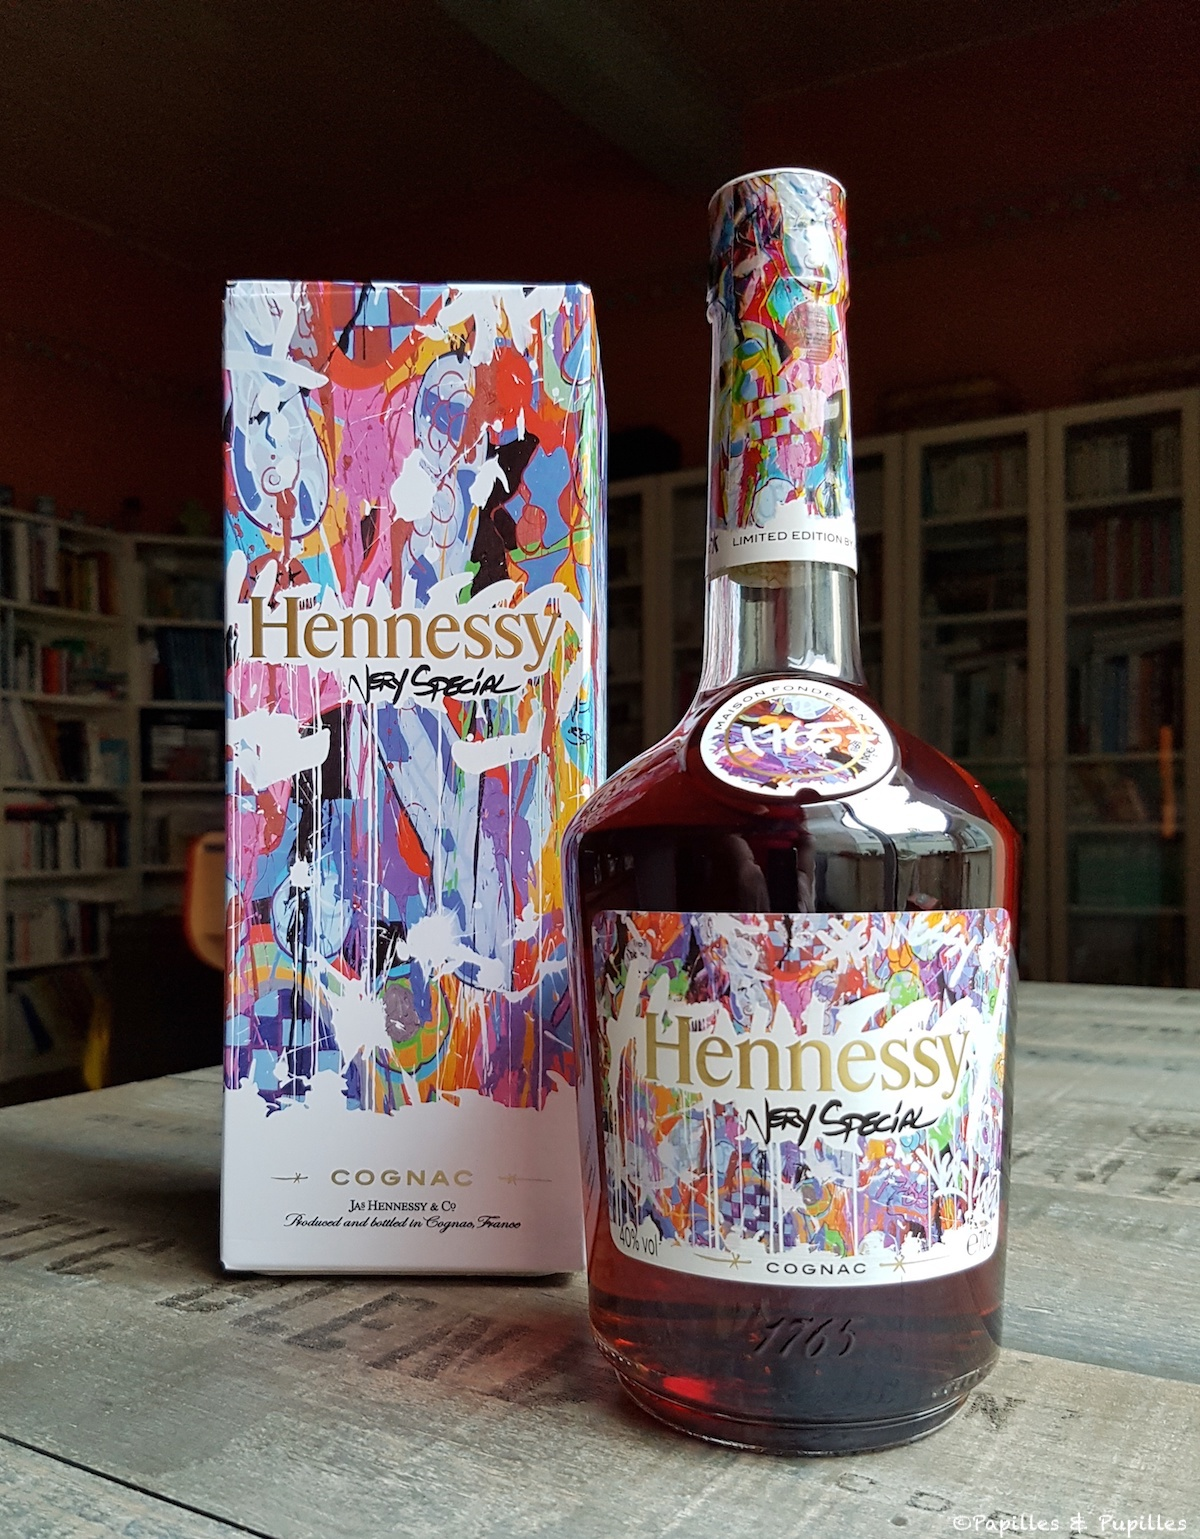 Cognac Hennessy